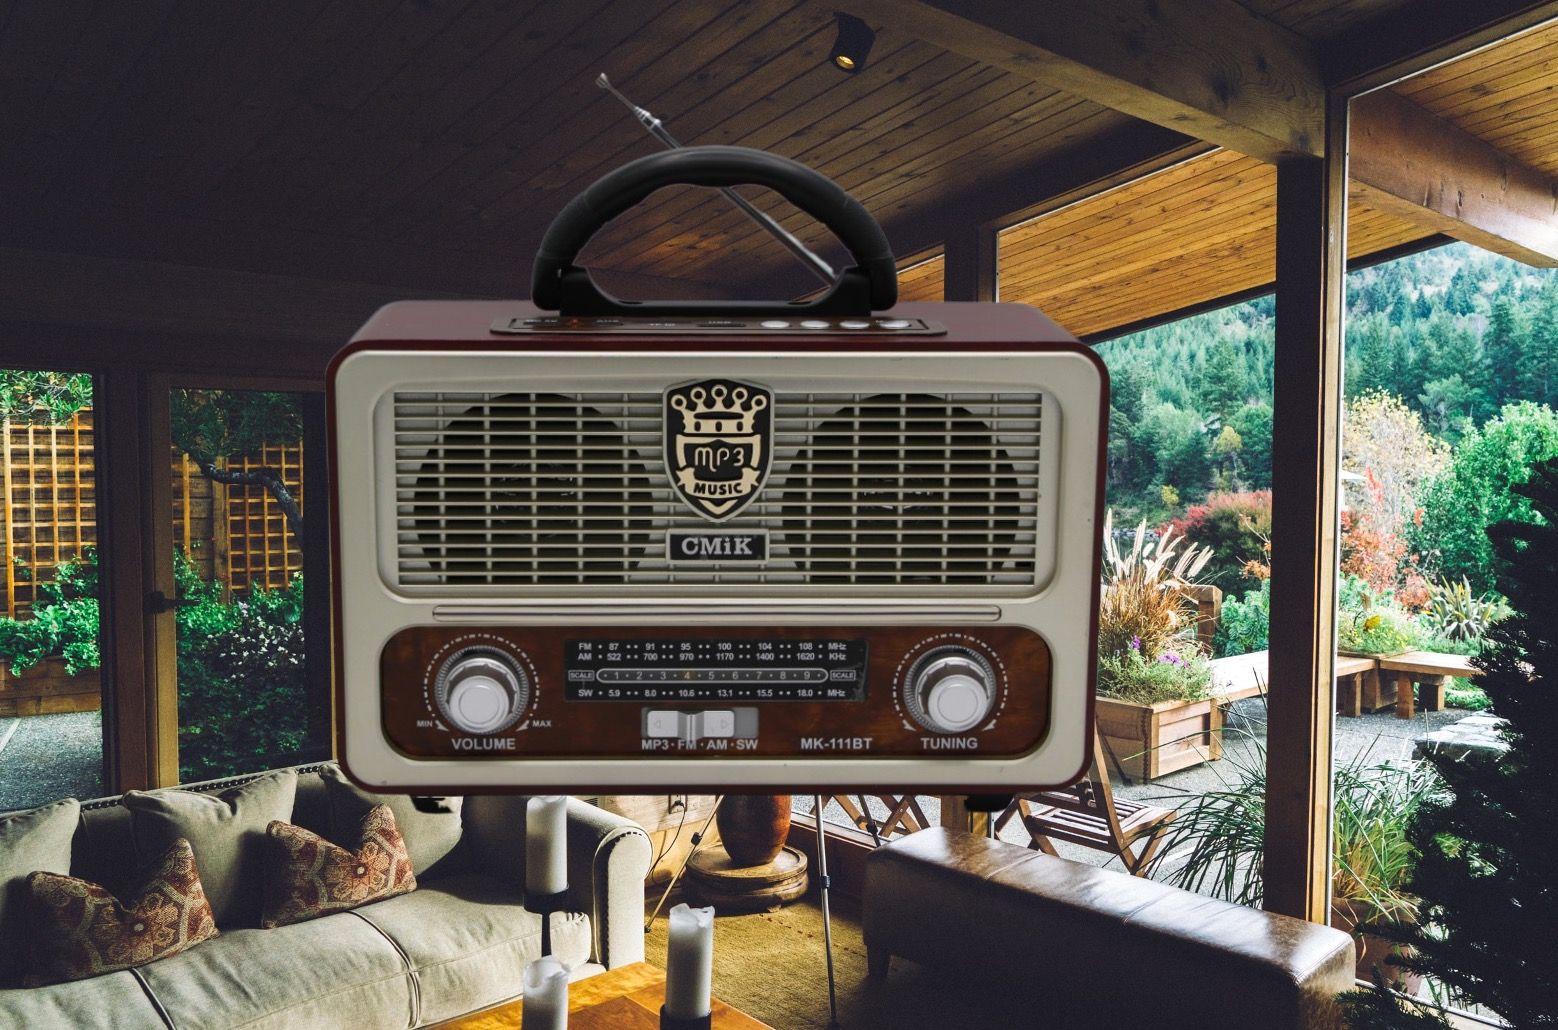 CMiK音响 MK-111BT插卡多波段蓝牙收音机 仿古机